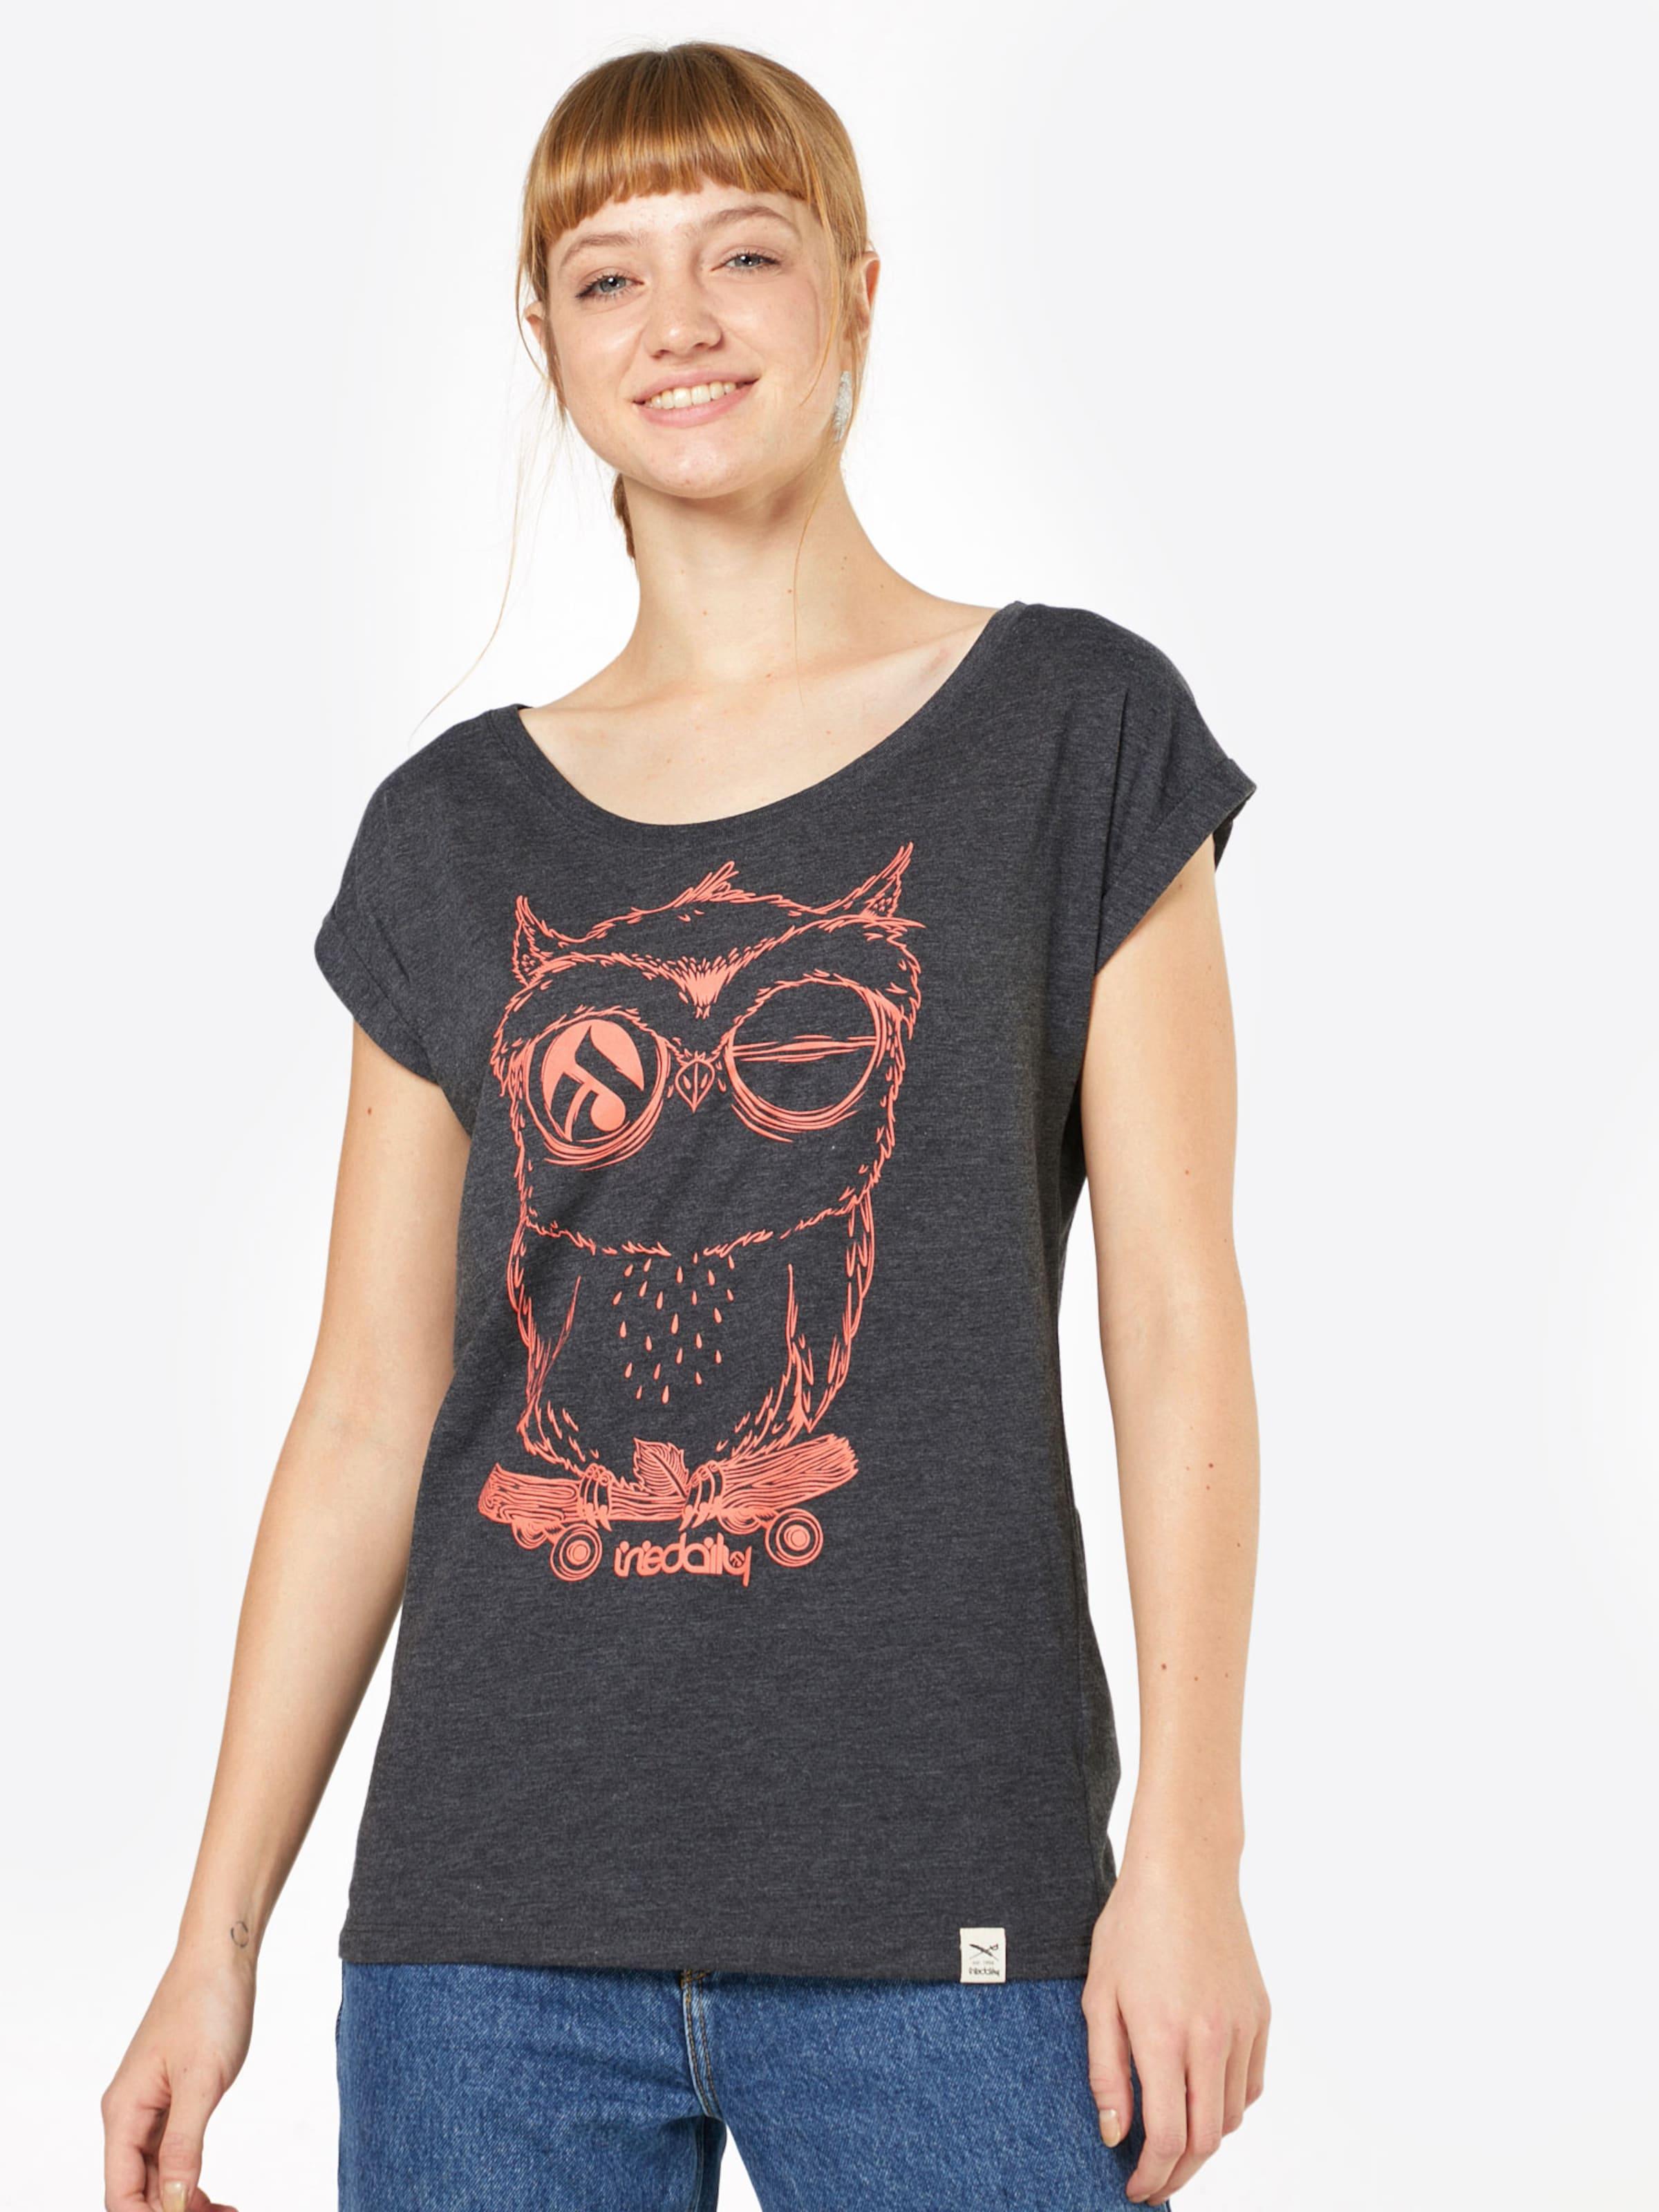 Anthrazit T Iriedaily shirt 2' In 'skateowl 6vb7Yfyg